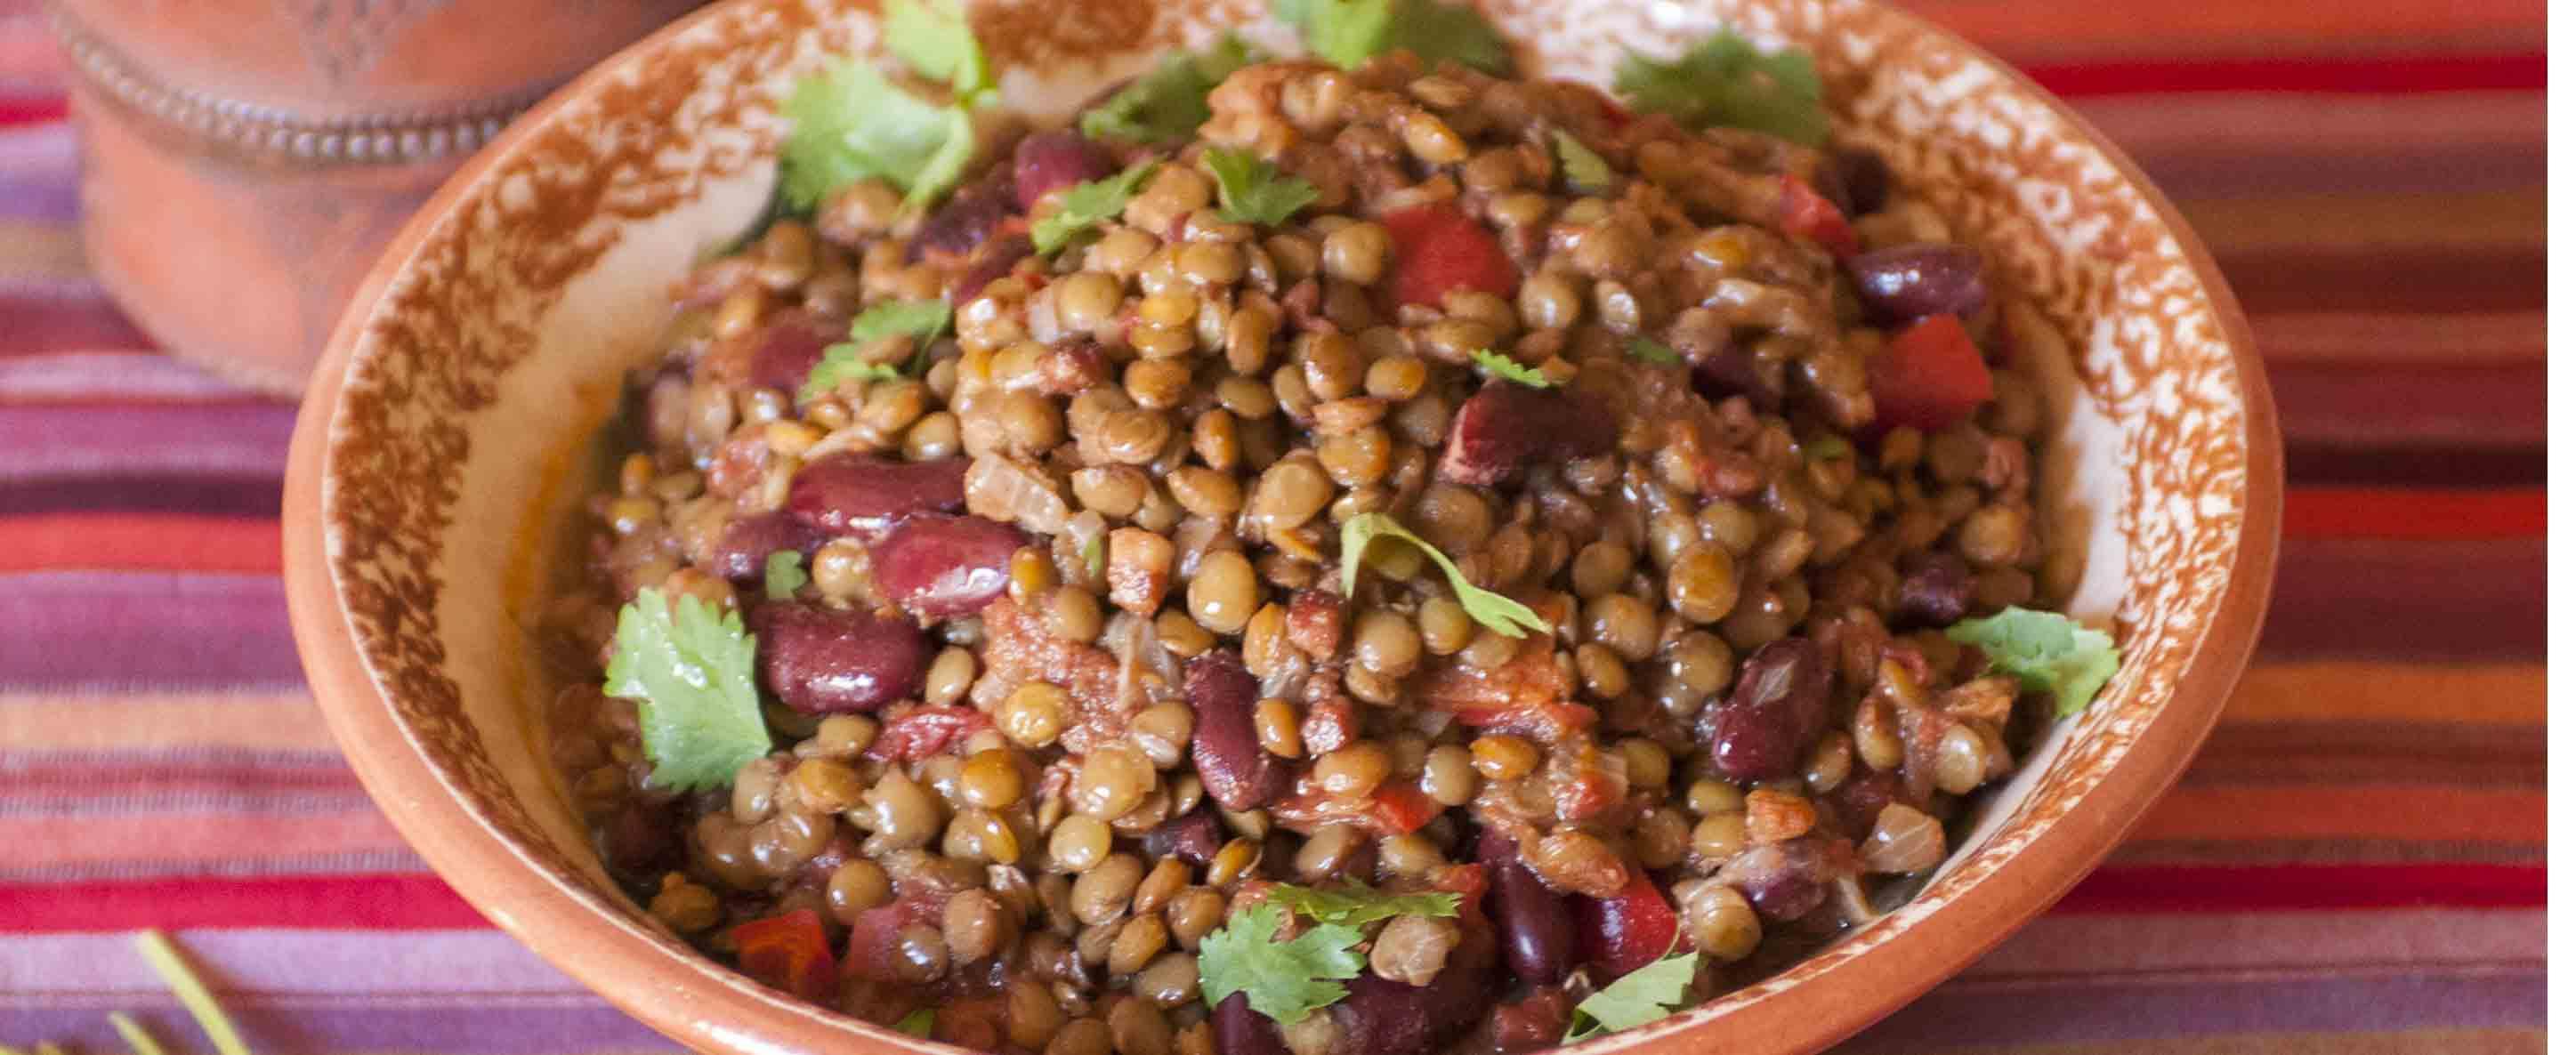 Lentil Chili - Gluten-Free Living